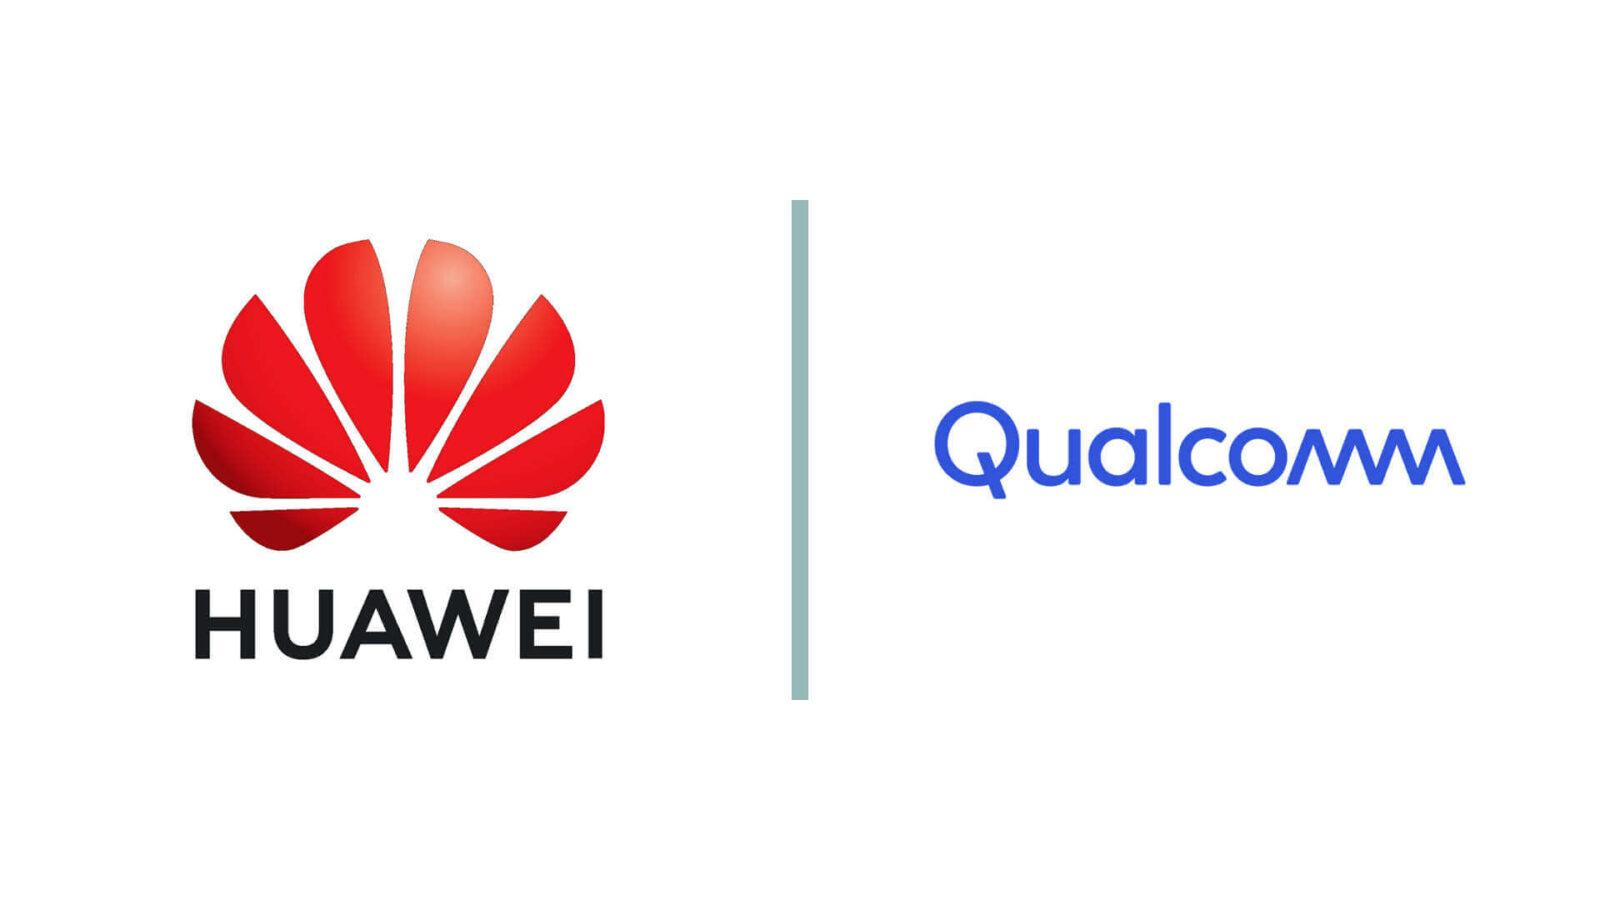 Qualcomm va furniza cipuri pentru Huawei